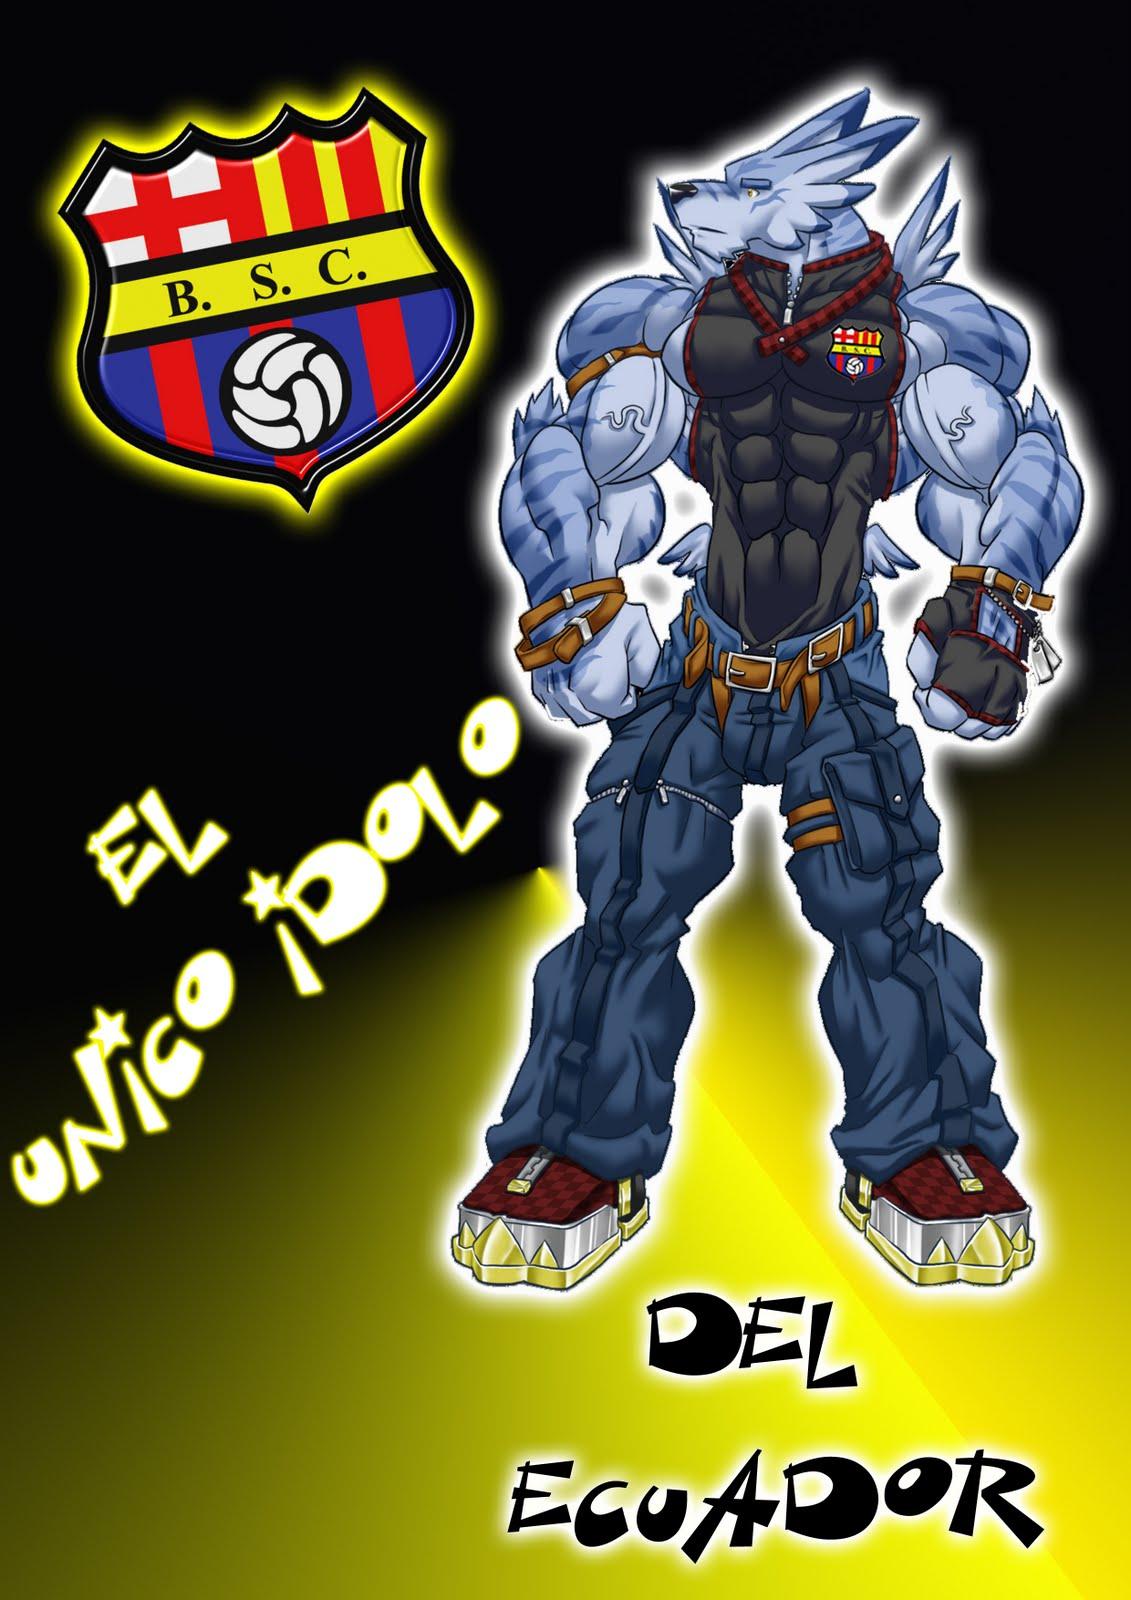 http://3.bp.blogspot.com/-OvpPHF3gATM/TXBD1ZPzhJI/AAAAAAAAAAk/fOKCGF9iZRM/s1600/barcelona%2B1.jpg